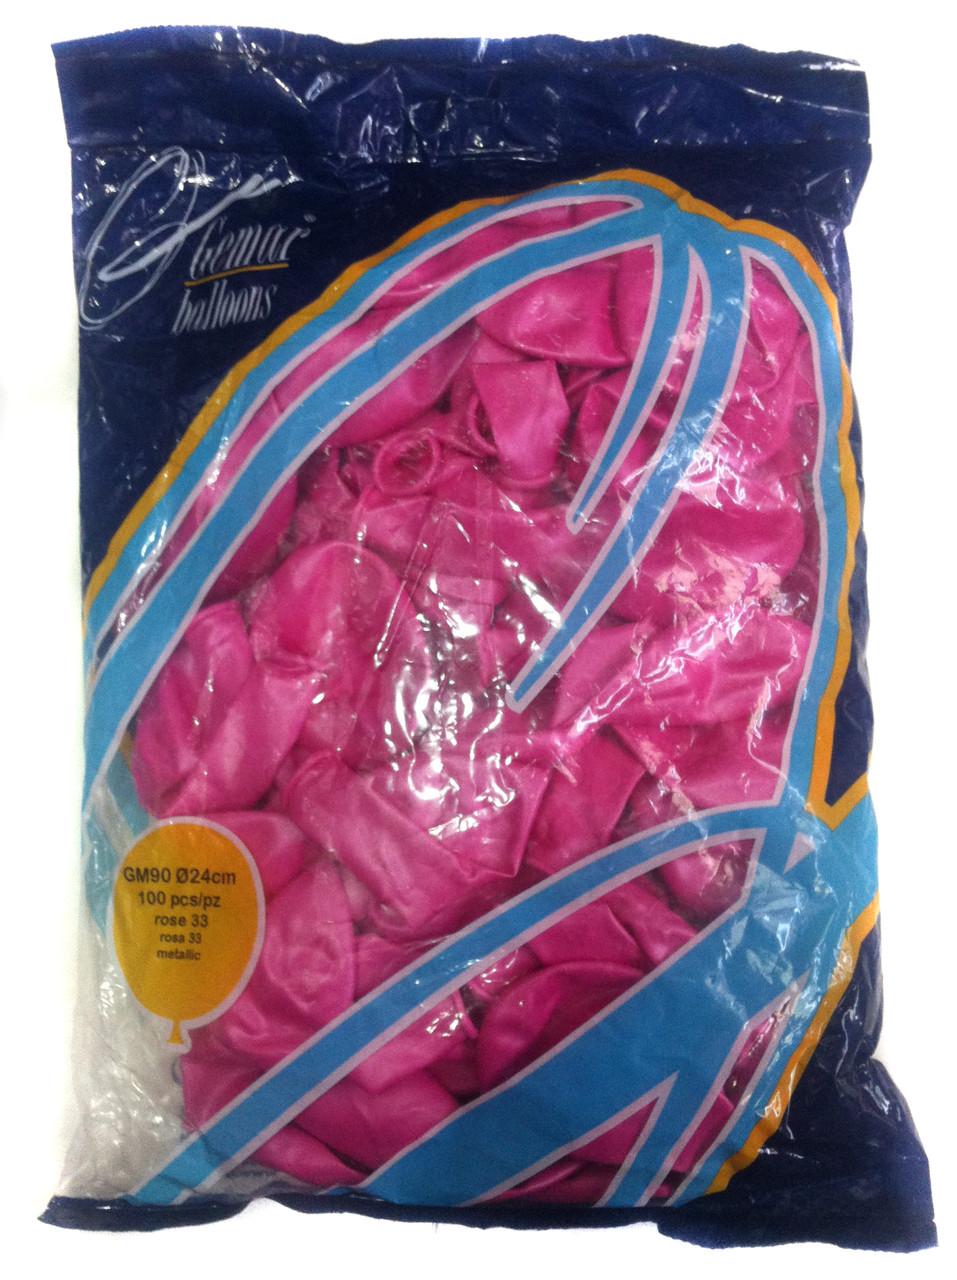 Шары надувные розовый перламутр (металлик), Gemar Balloons GM90, 100шт.